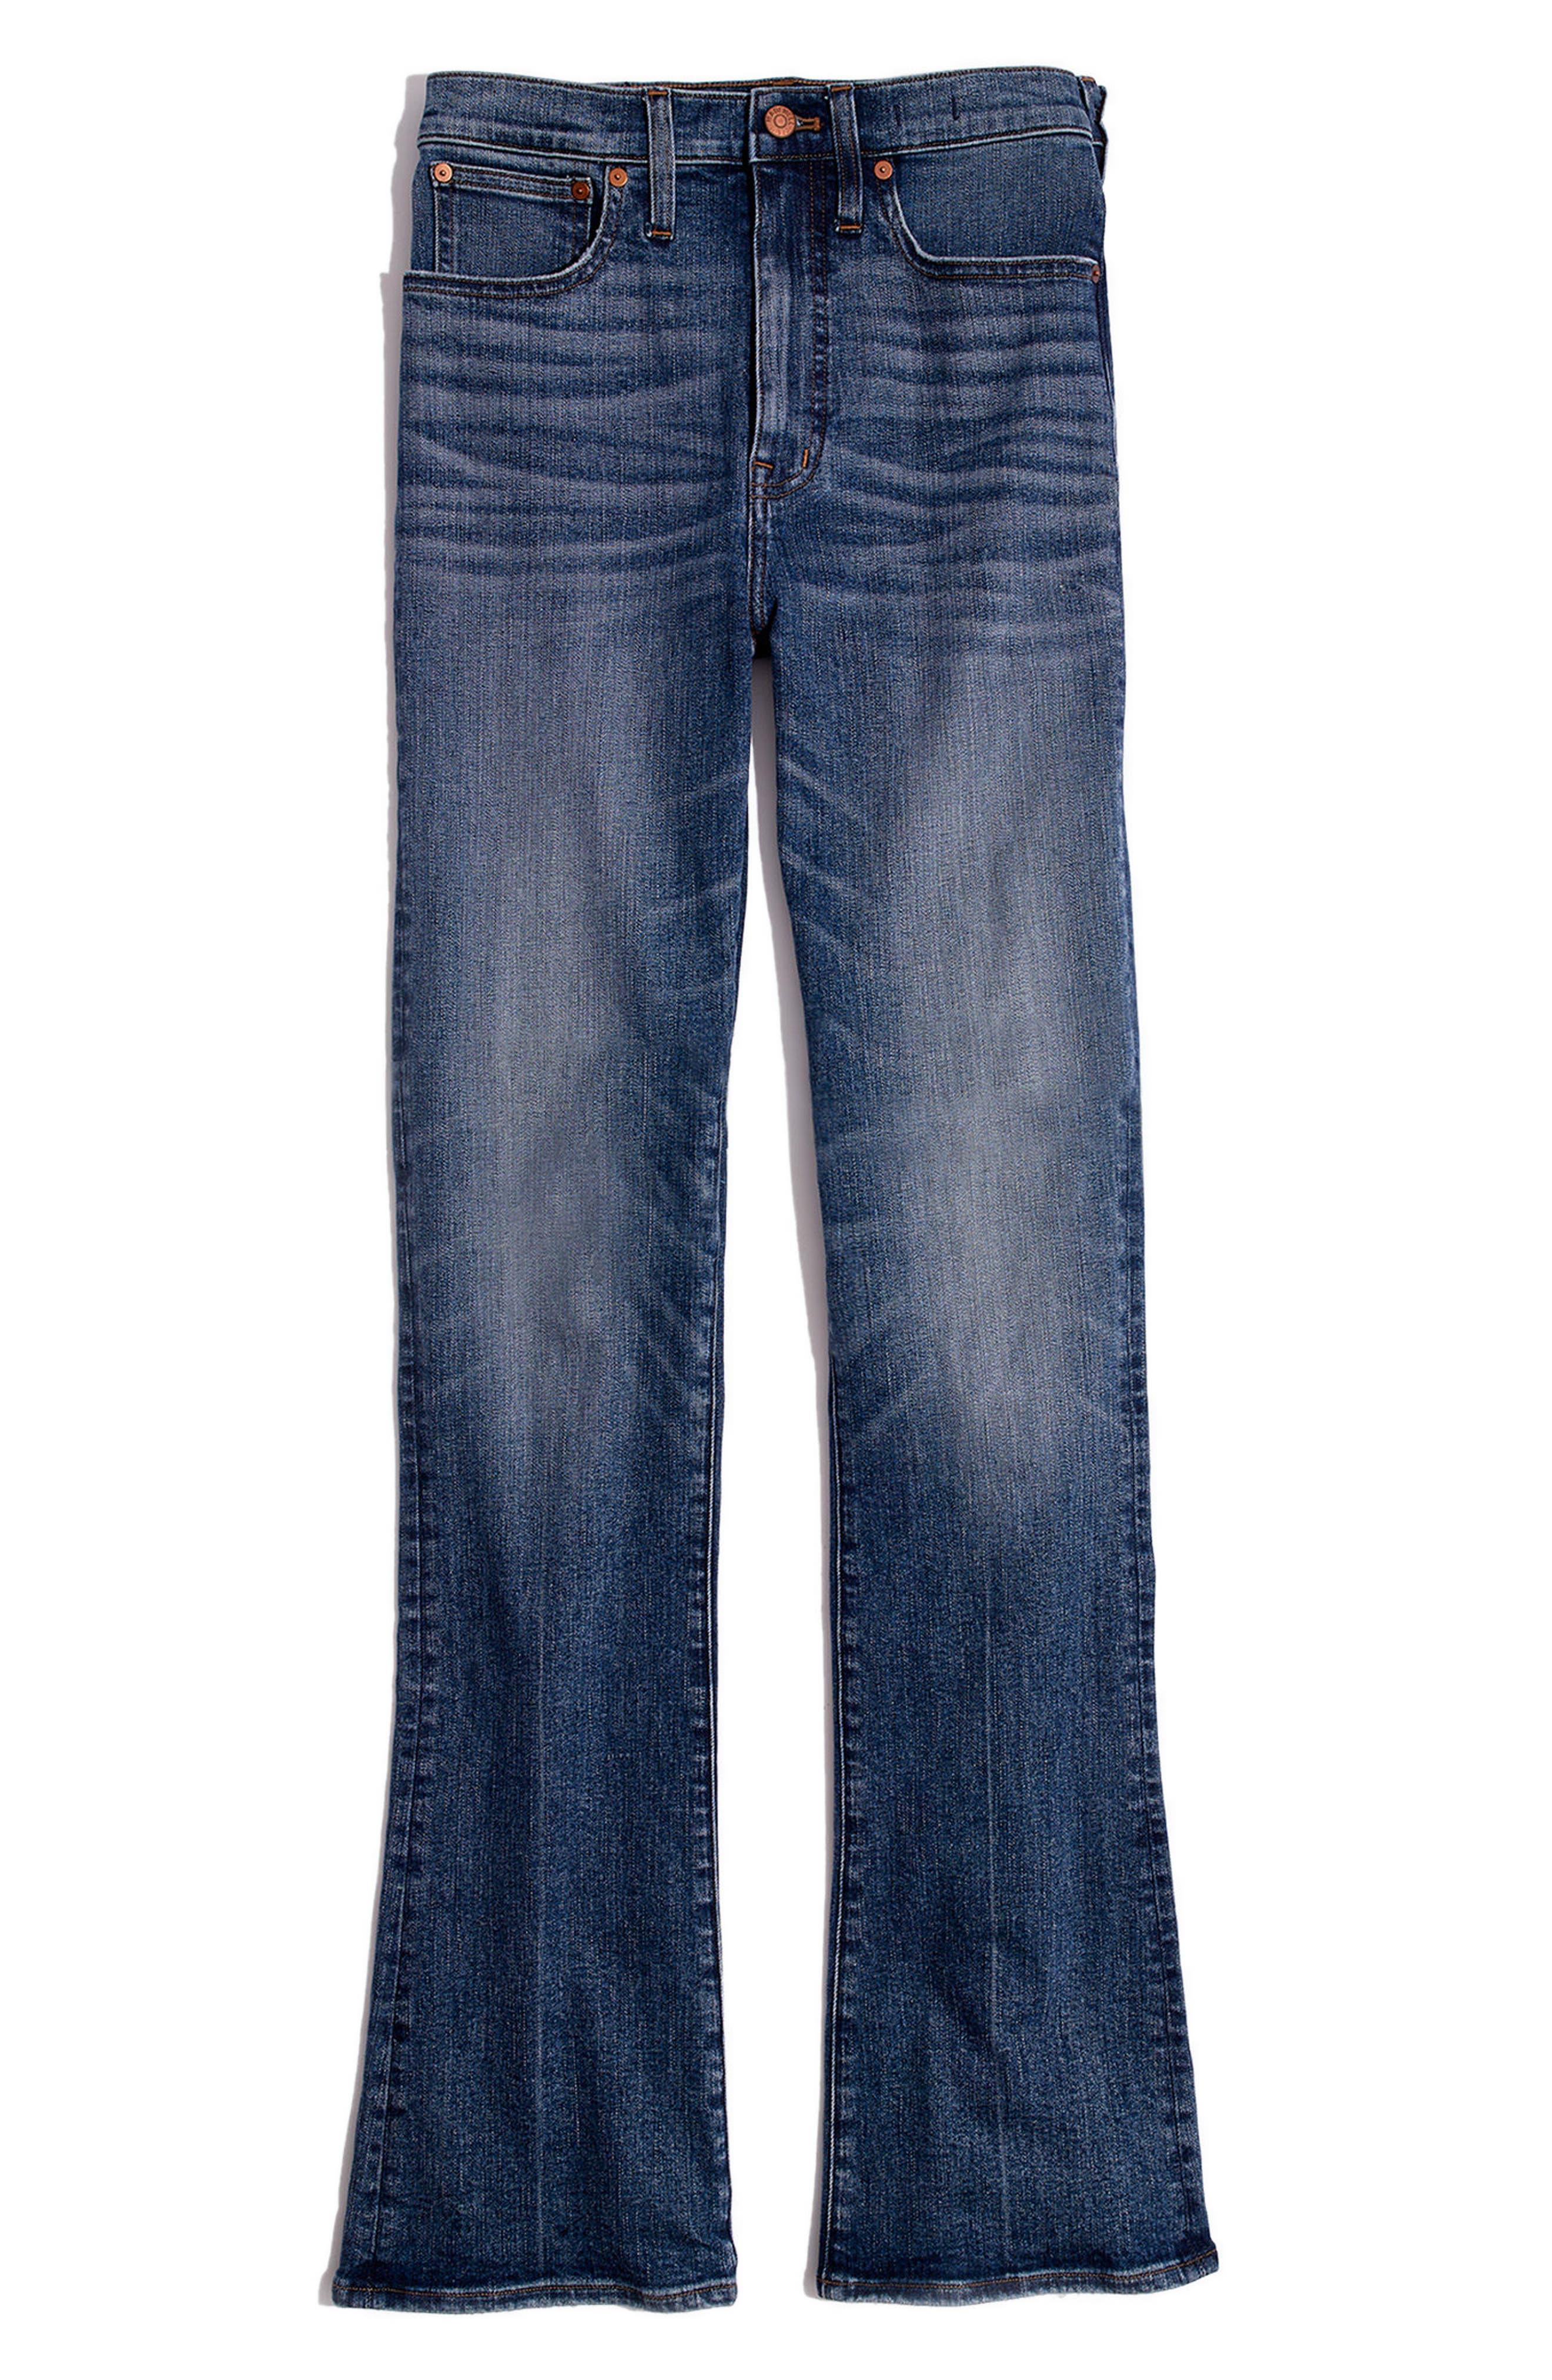 Skinny Flare Leg Jeans,                             Alternate thumbnail 4, color,                             400